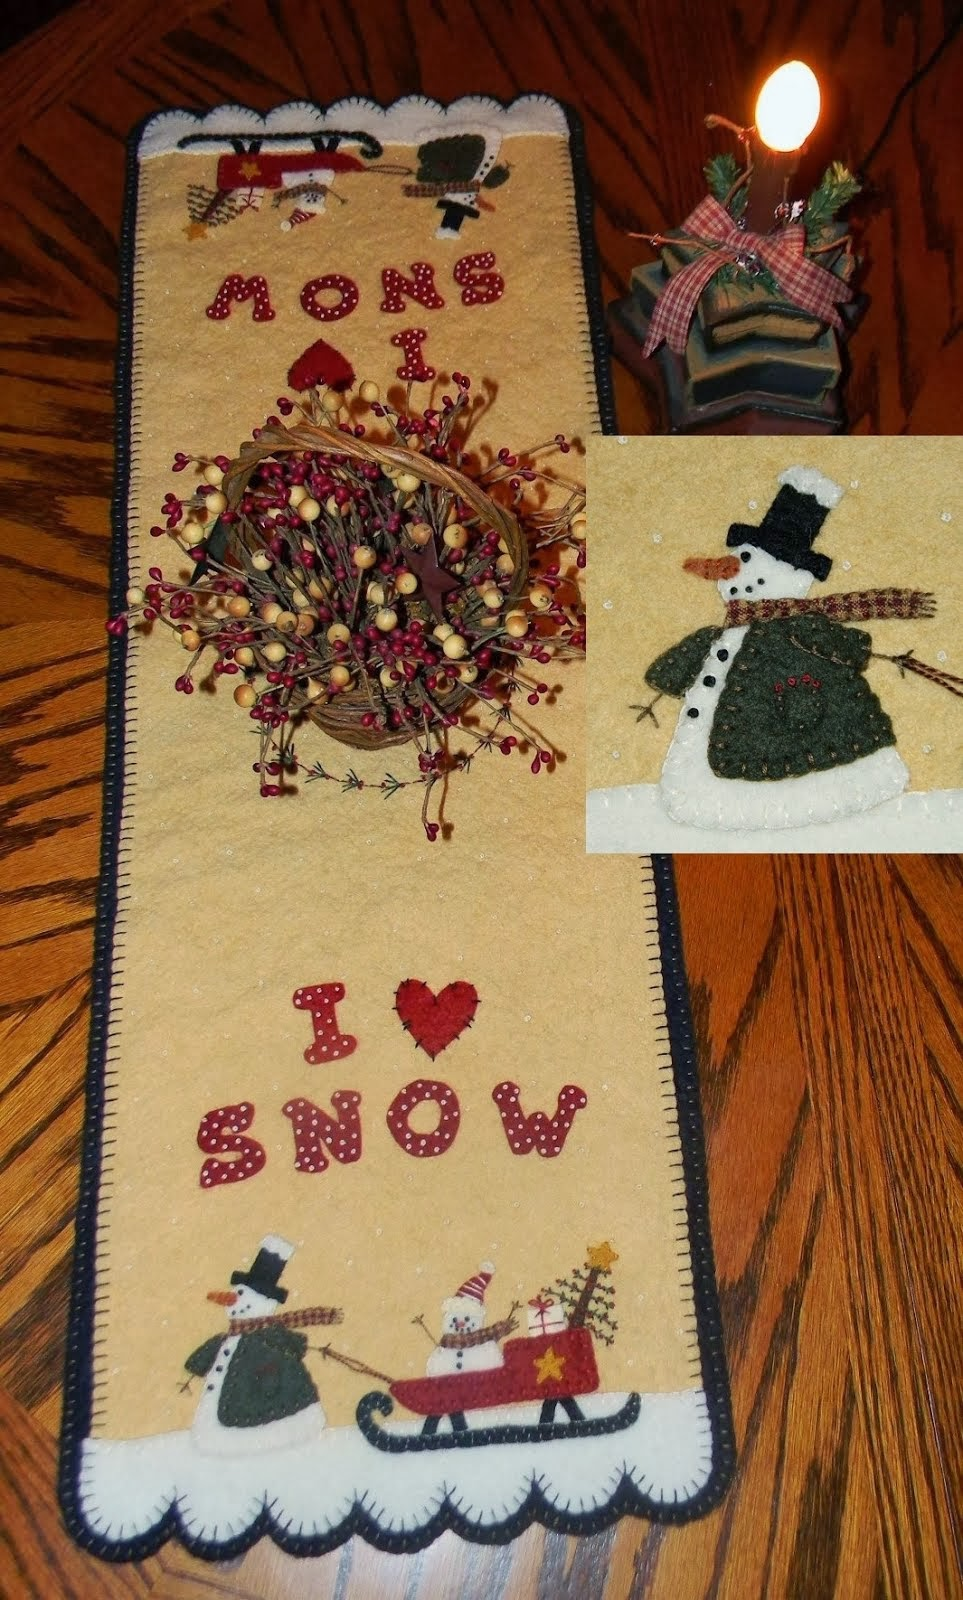 ~*I Love Snow*~